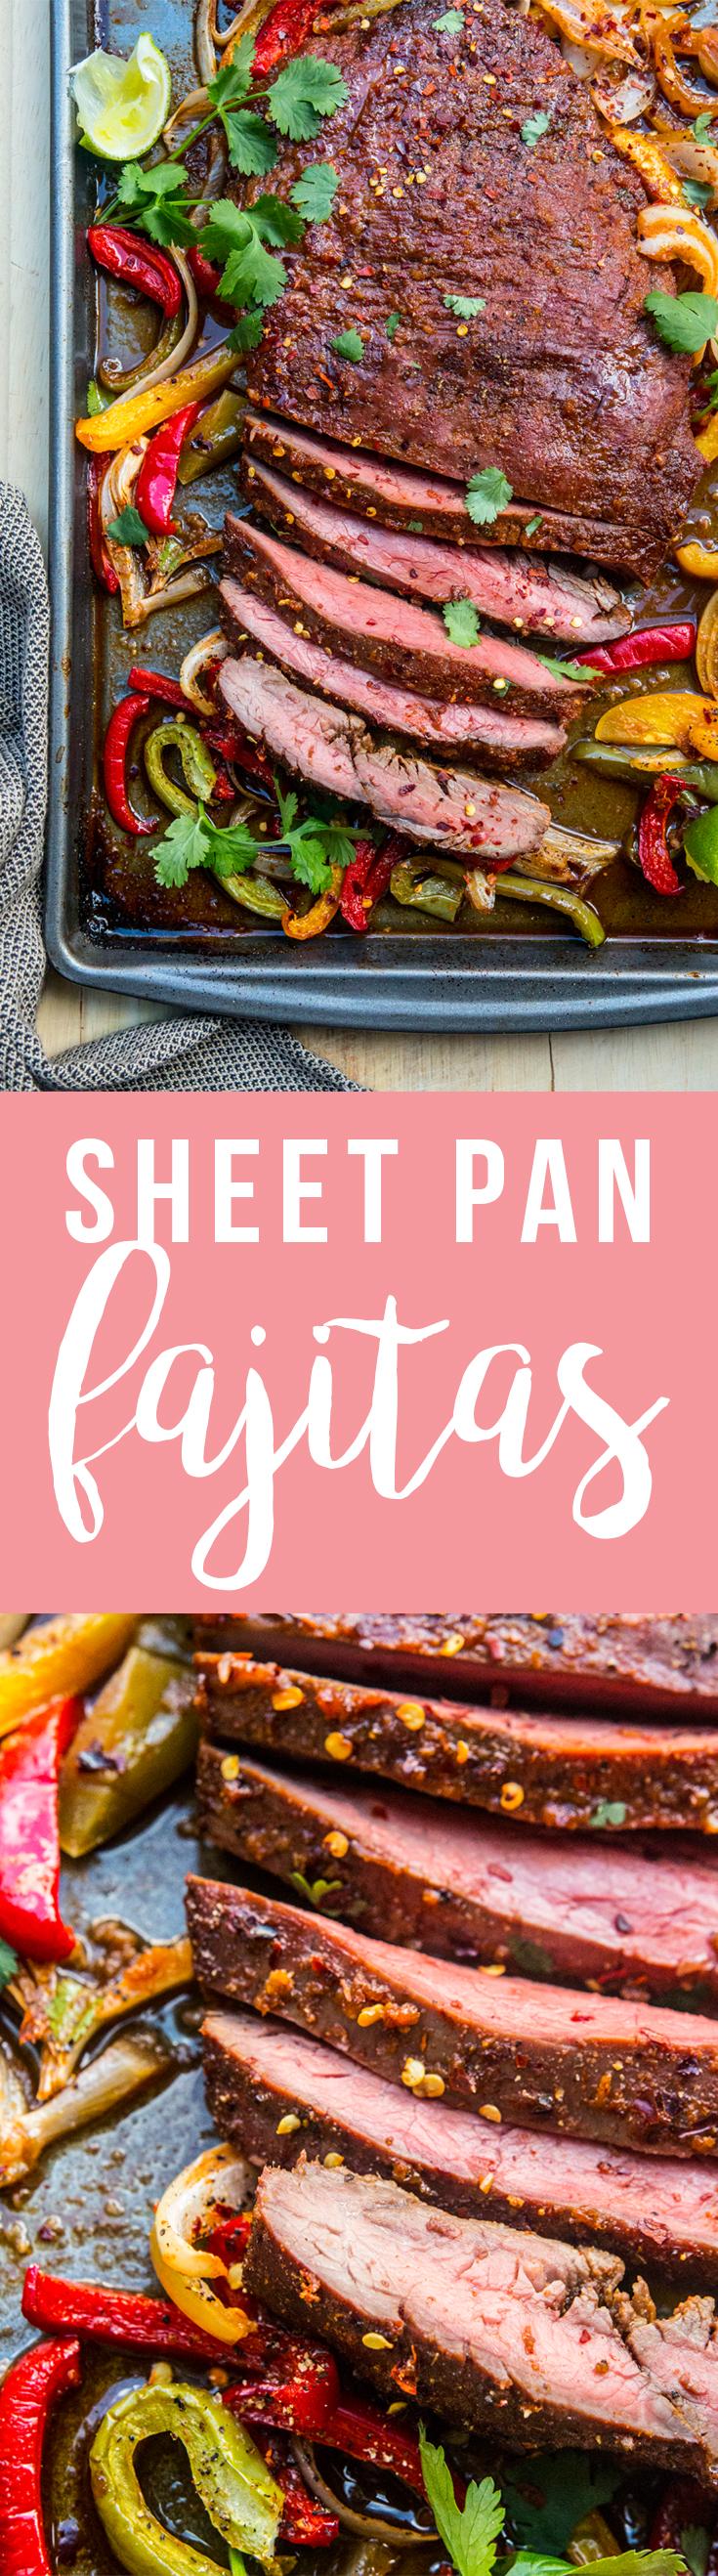 Sheet Pan Fajitas: easy, tasty, one-pan meal! | Fresh Planet Flavor